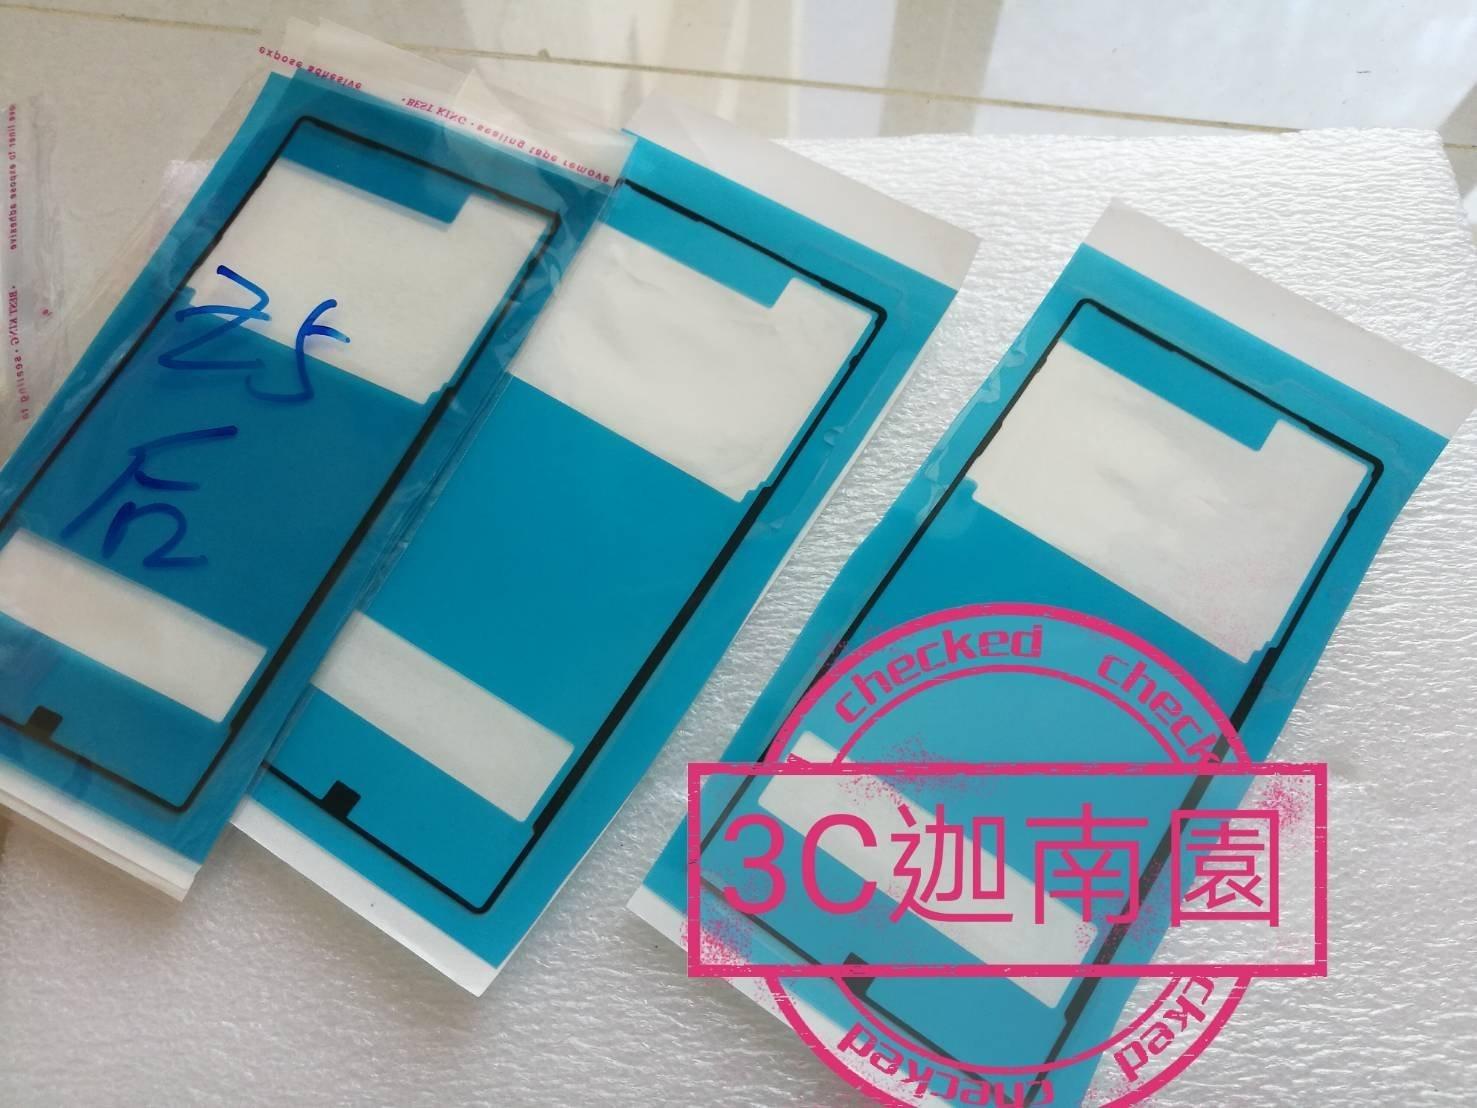 【3M IP防水級】現貨 全新 SONY Xperia Z5 原廠背蓋膠 後背膠 背蓋黏膠 電池蓋 背蓋 防水膠條